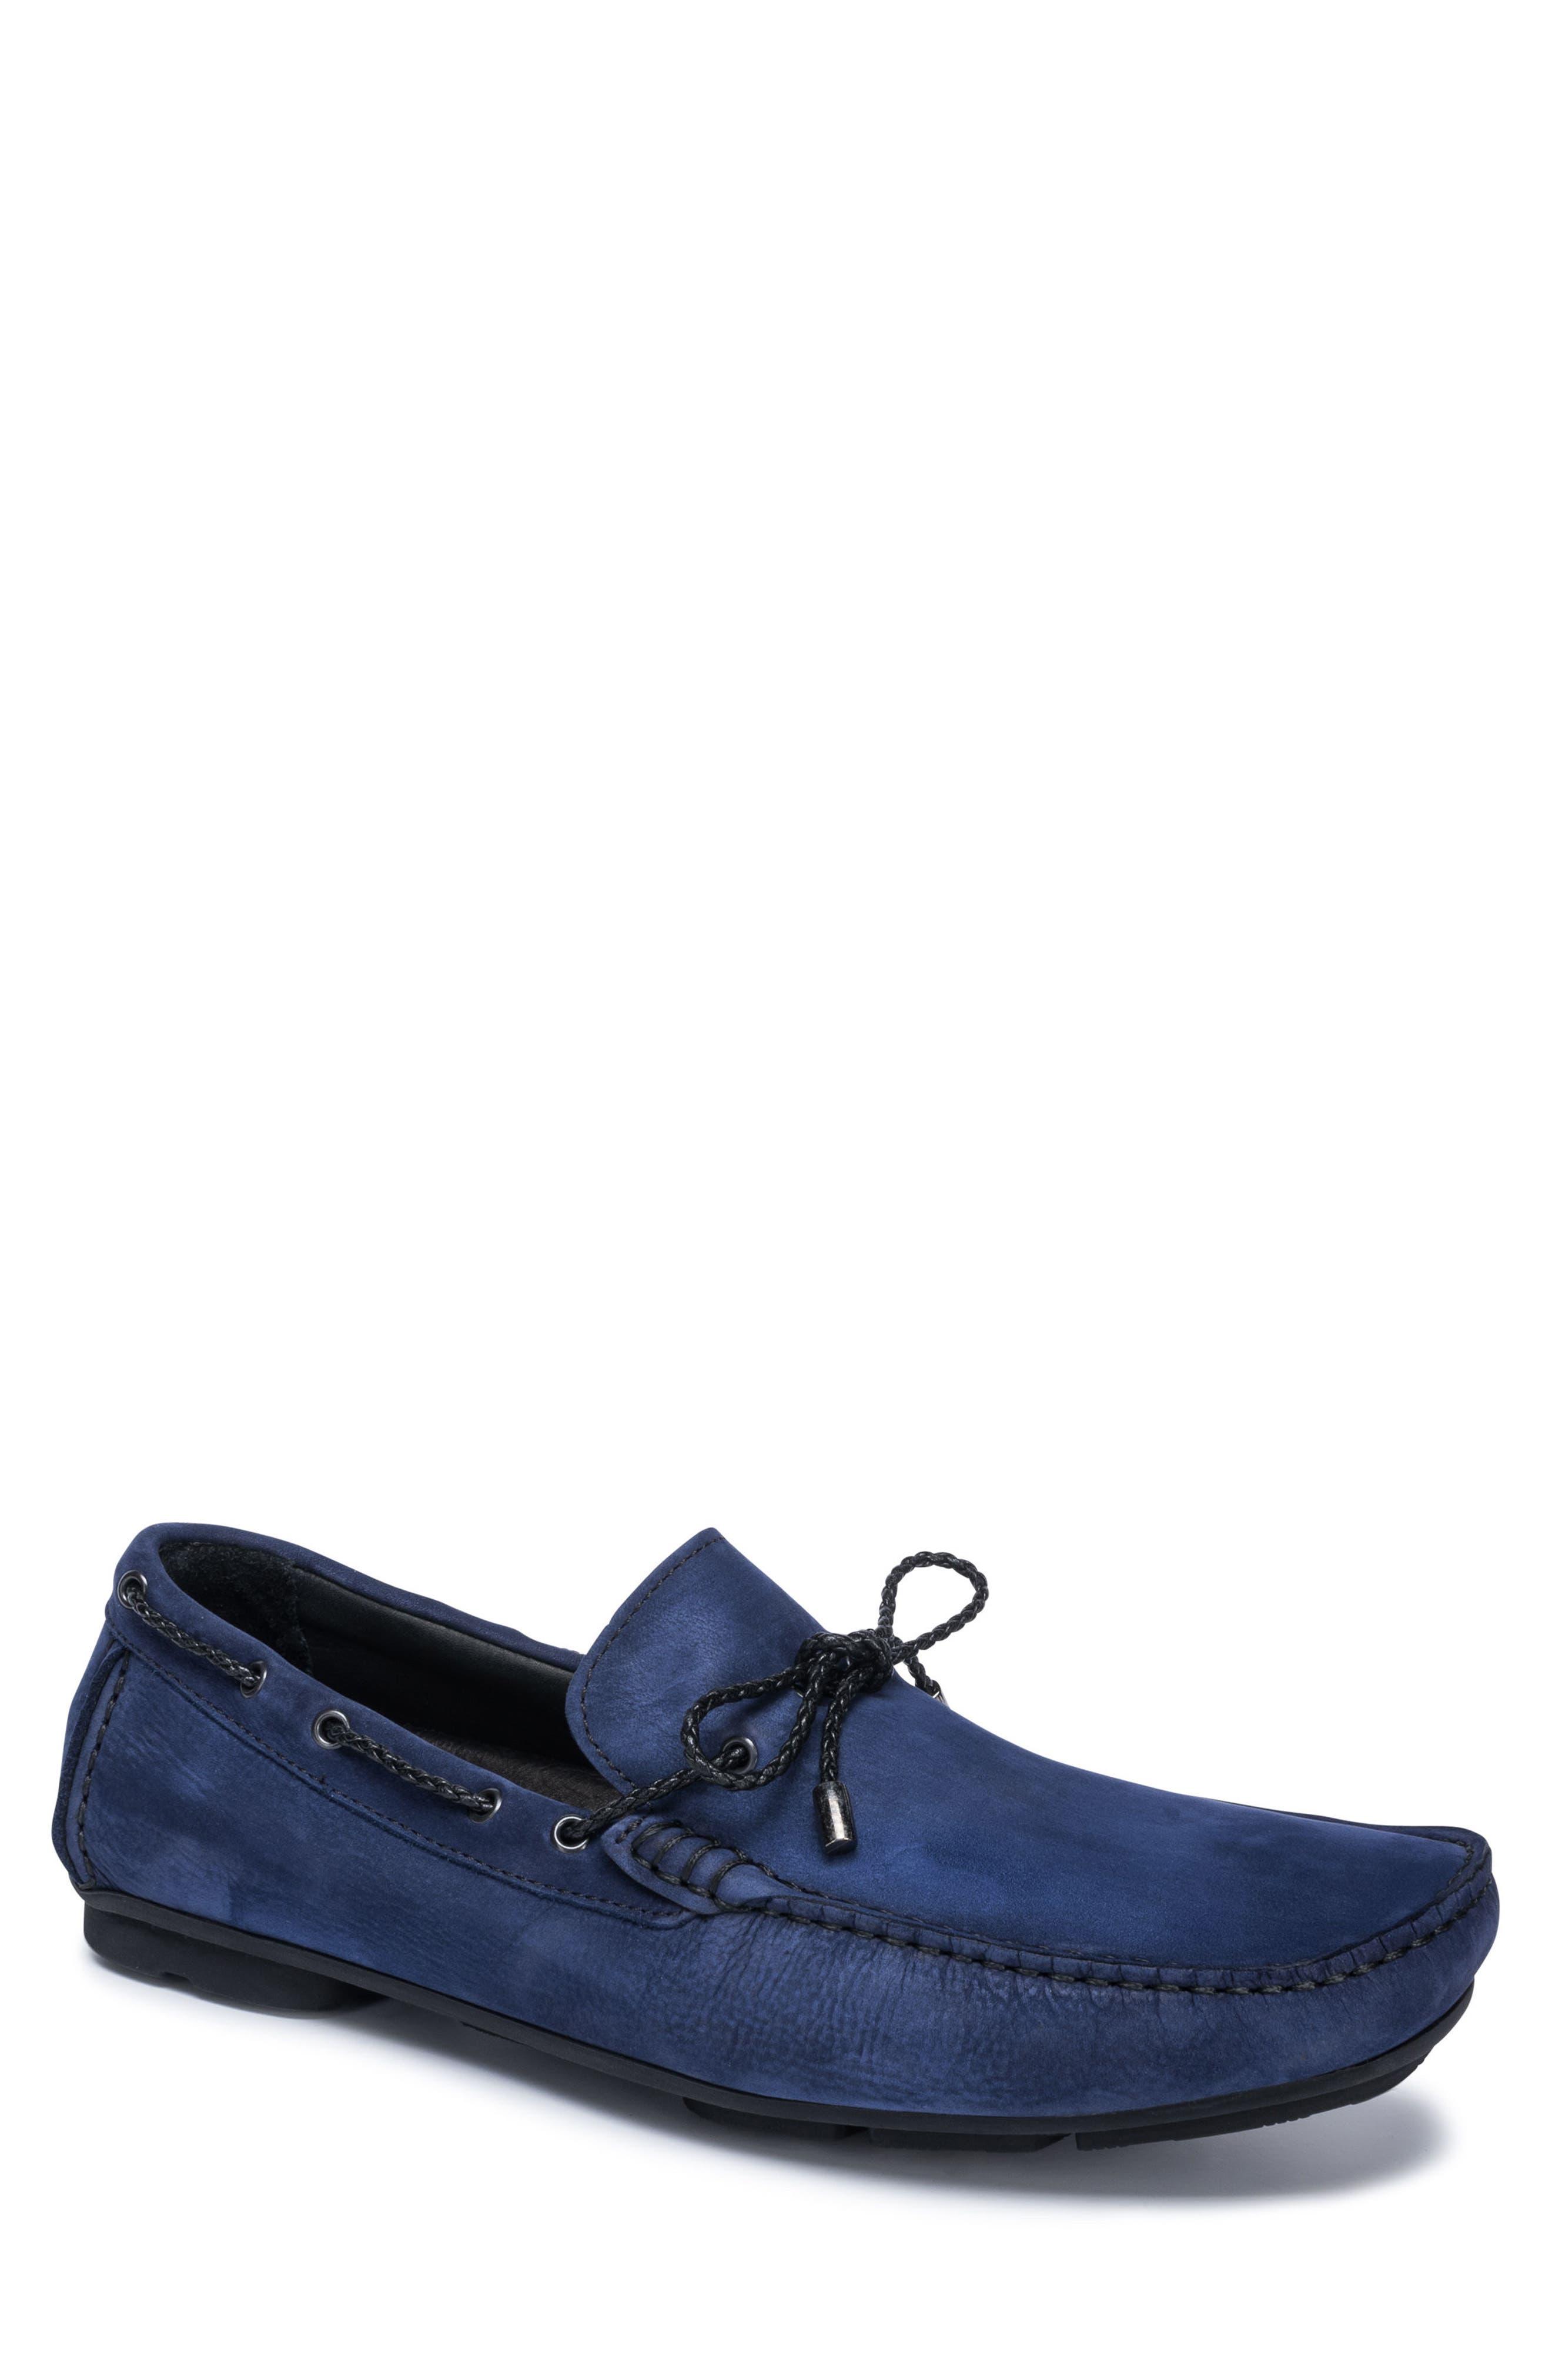 Main Image - Bugatchi Napoli Driving Shoe (Men)